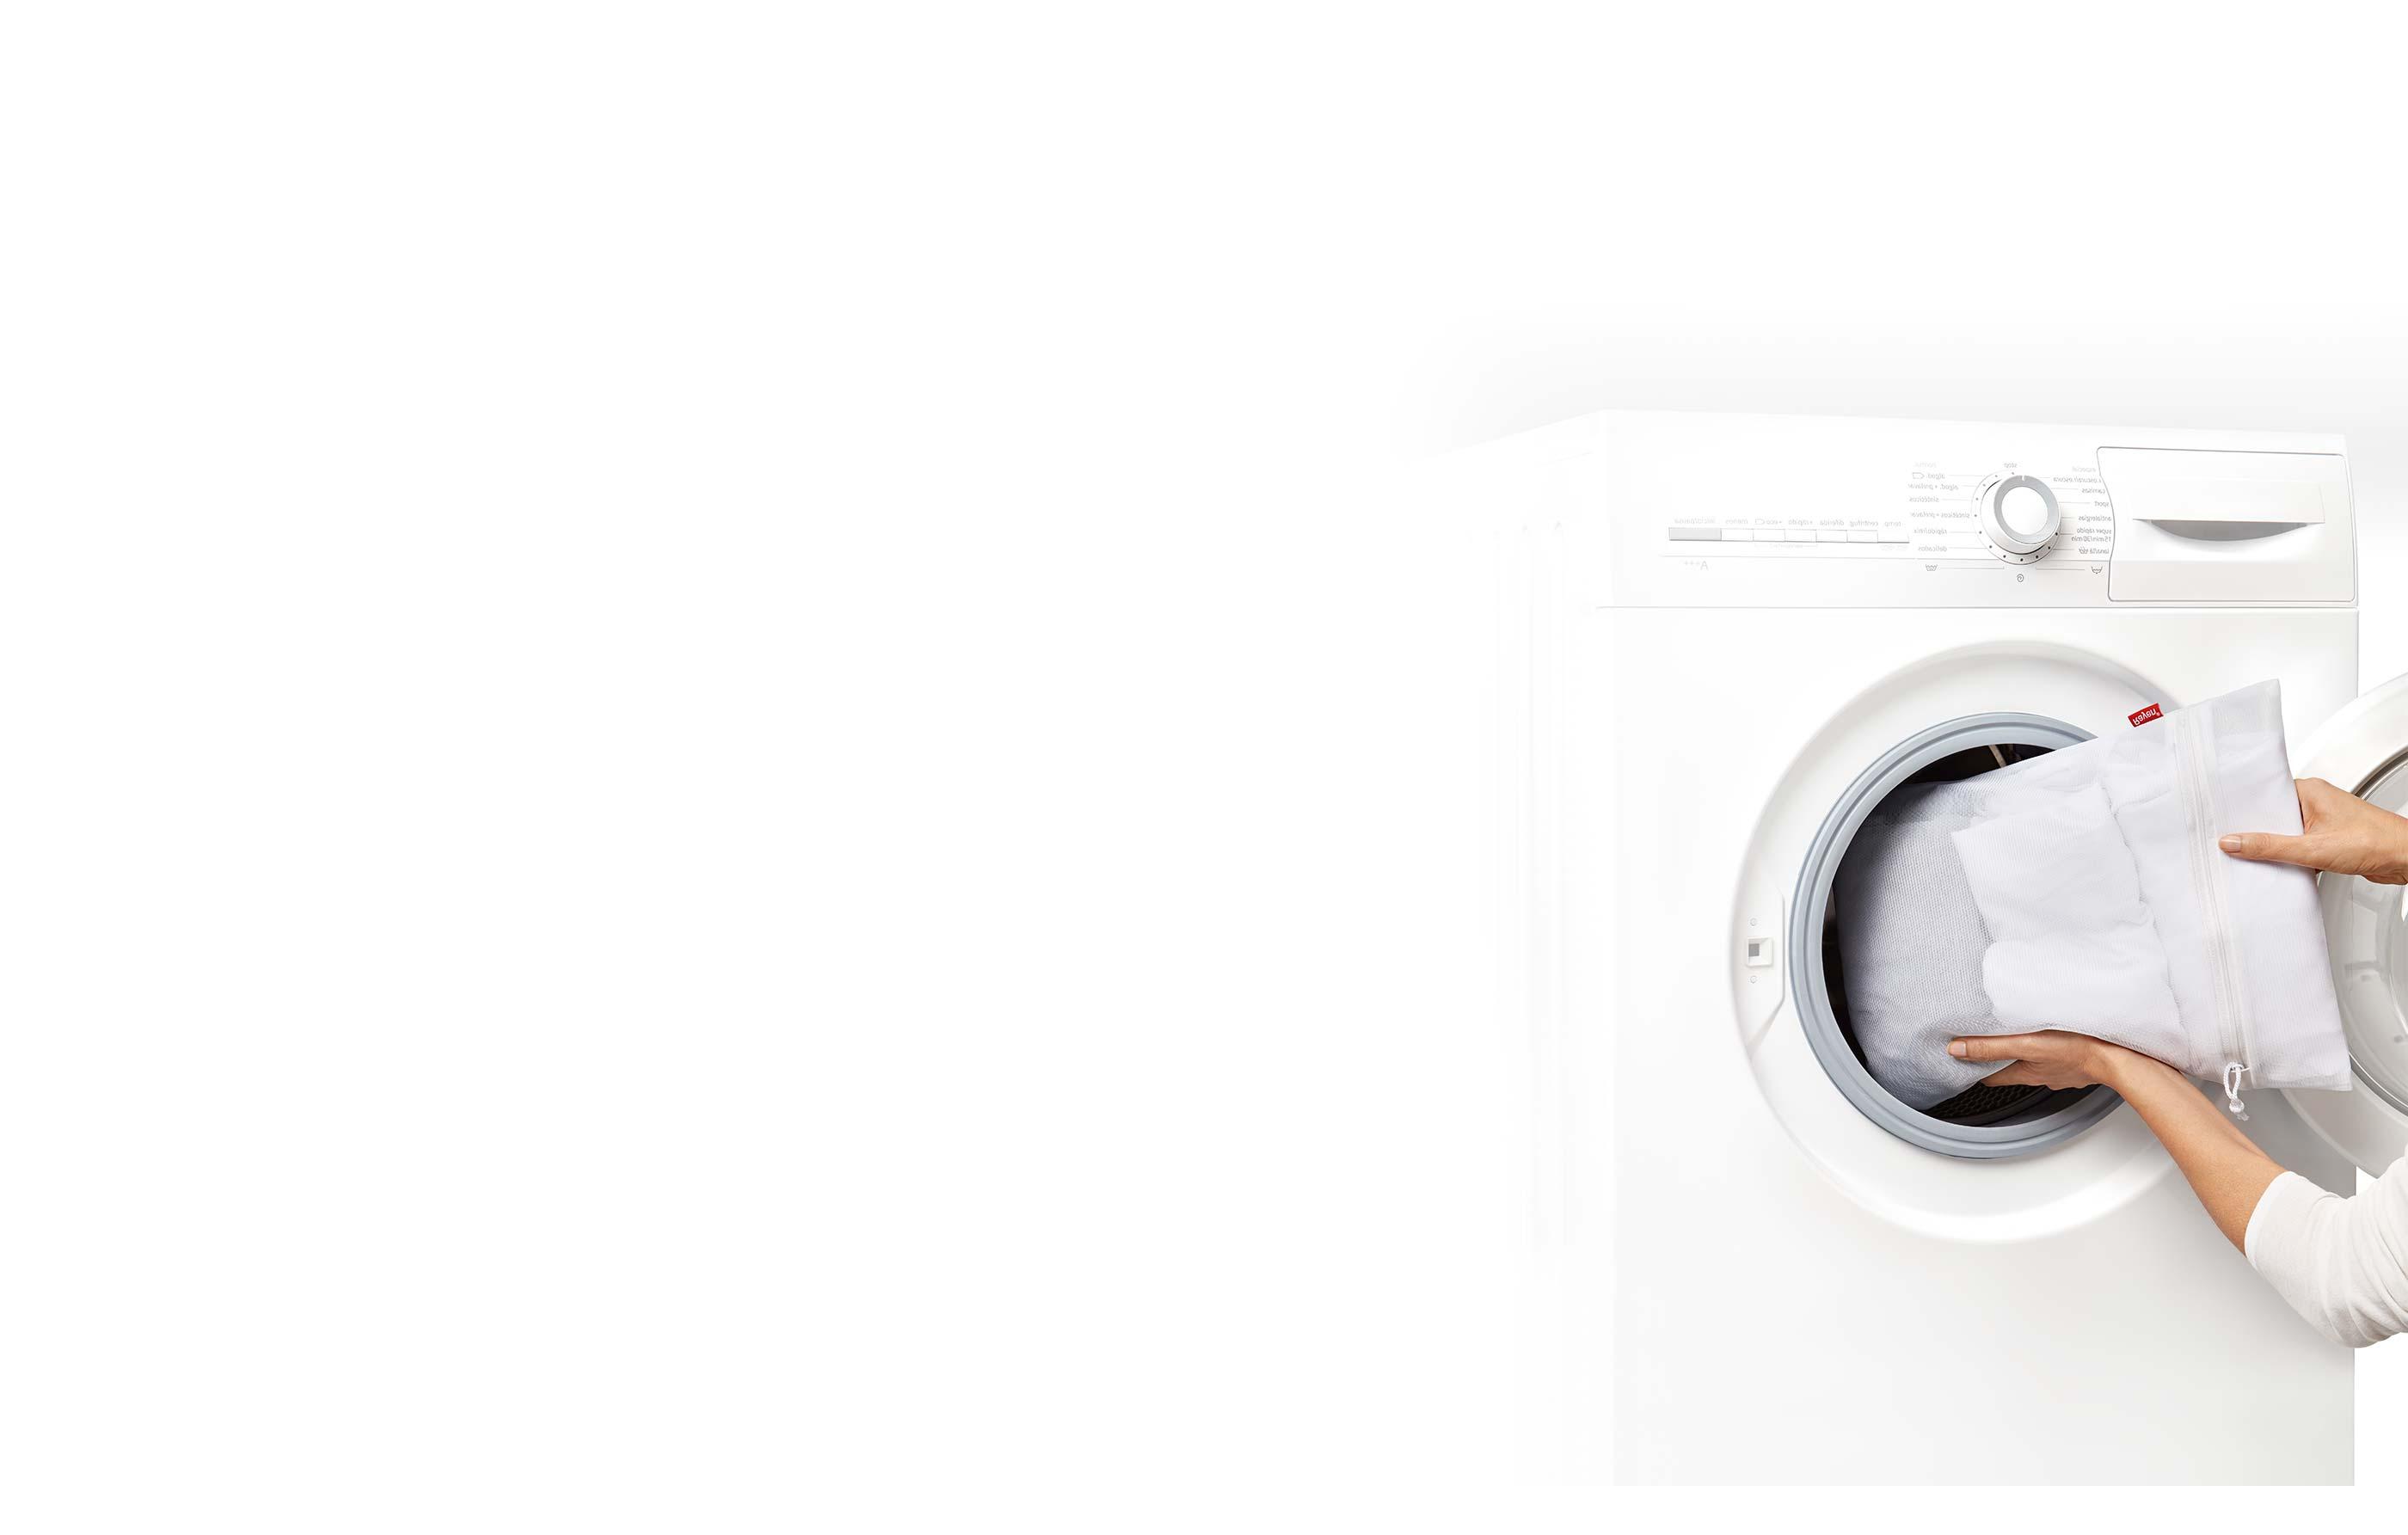 bolsa-lavadora-4 bolsa-lavadora-4 | Rayen.com